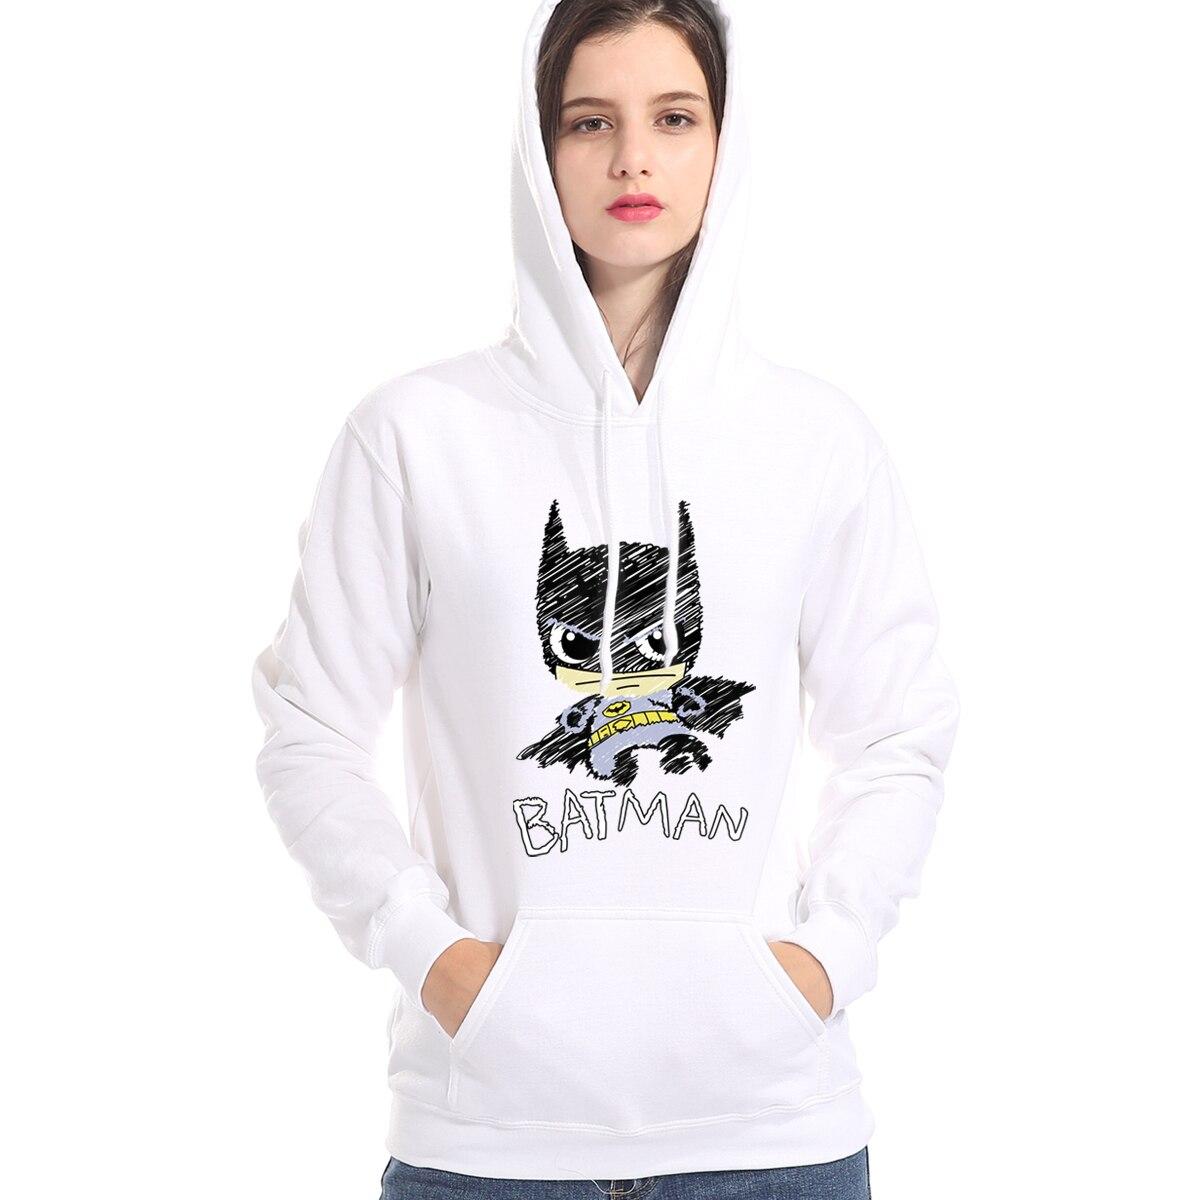 Funny BATMAN Cartoon Print Hoody Autumn Winter 2019 Brand Clothes Female Sweatshirt Harajuku Women's Sportswear Kpop Hoodies